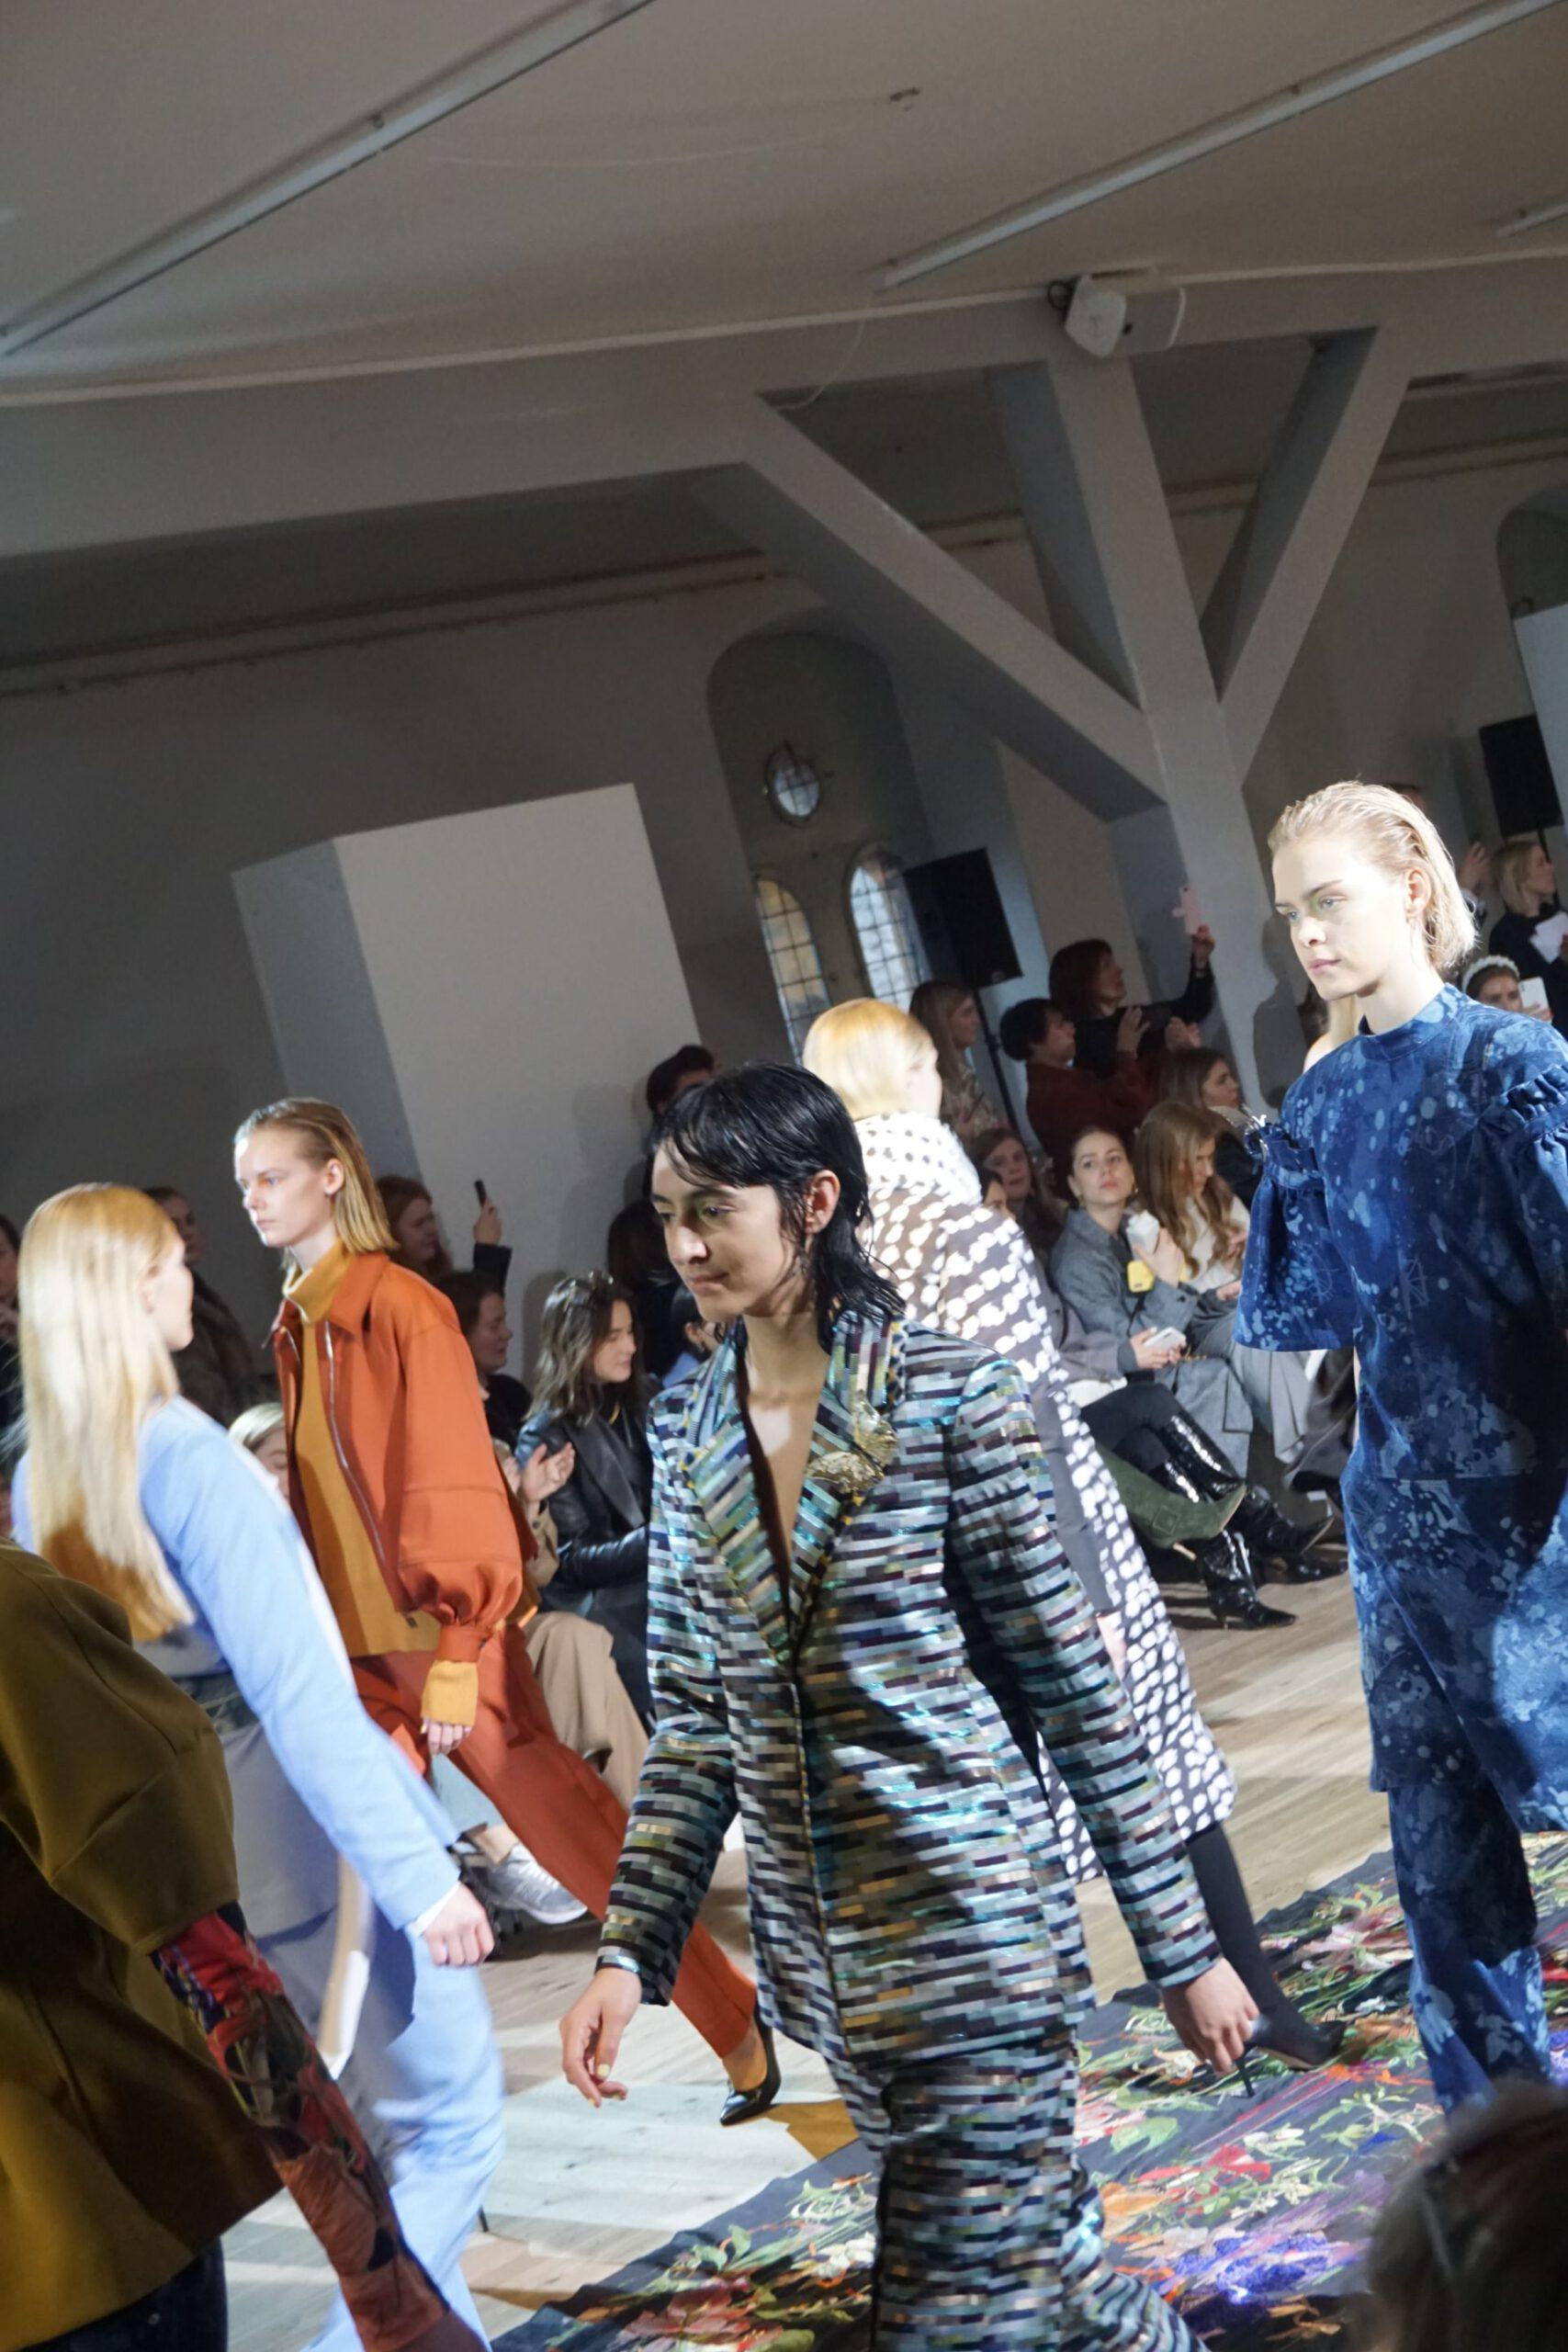 blanche copenhagen fashion show 18